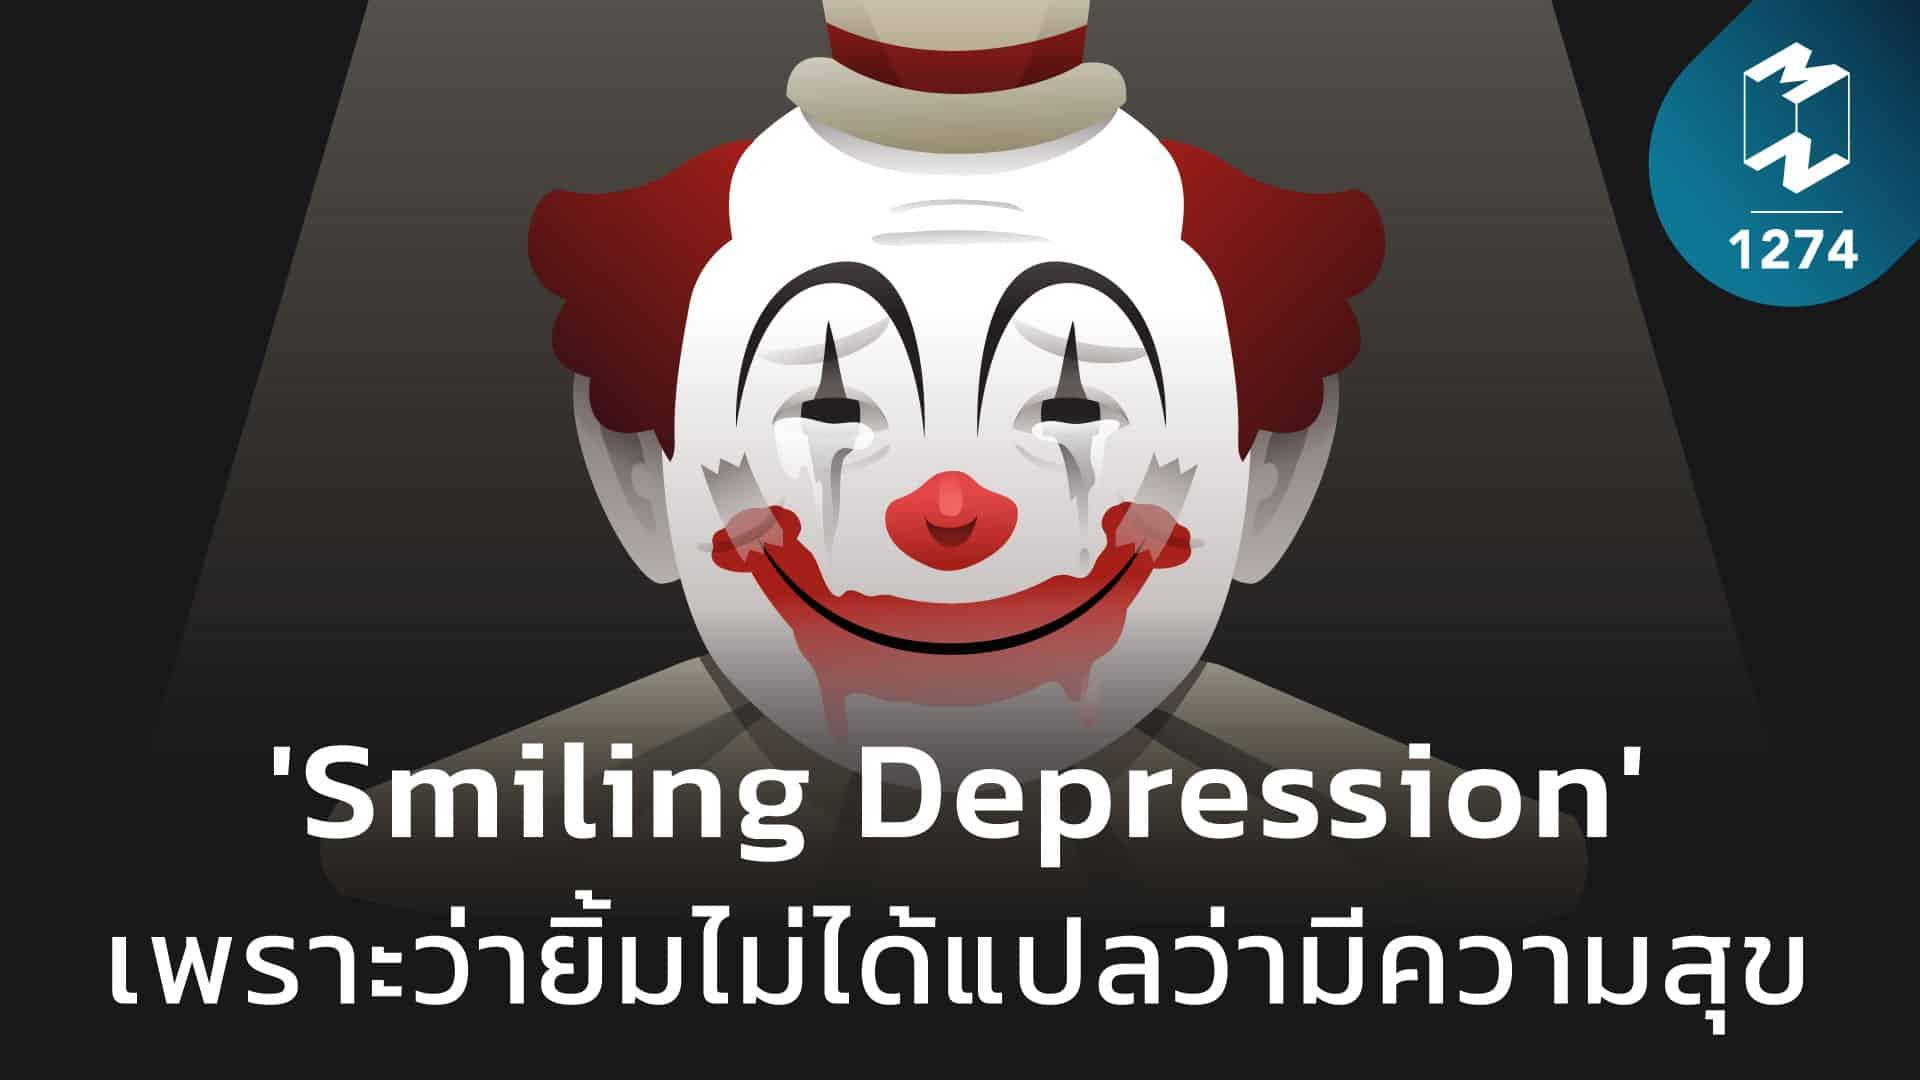 'Smiling Depression' เพราะว่ายิ้มไม่ได้แปลว่ามีความสุข | MM EP.1274